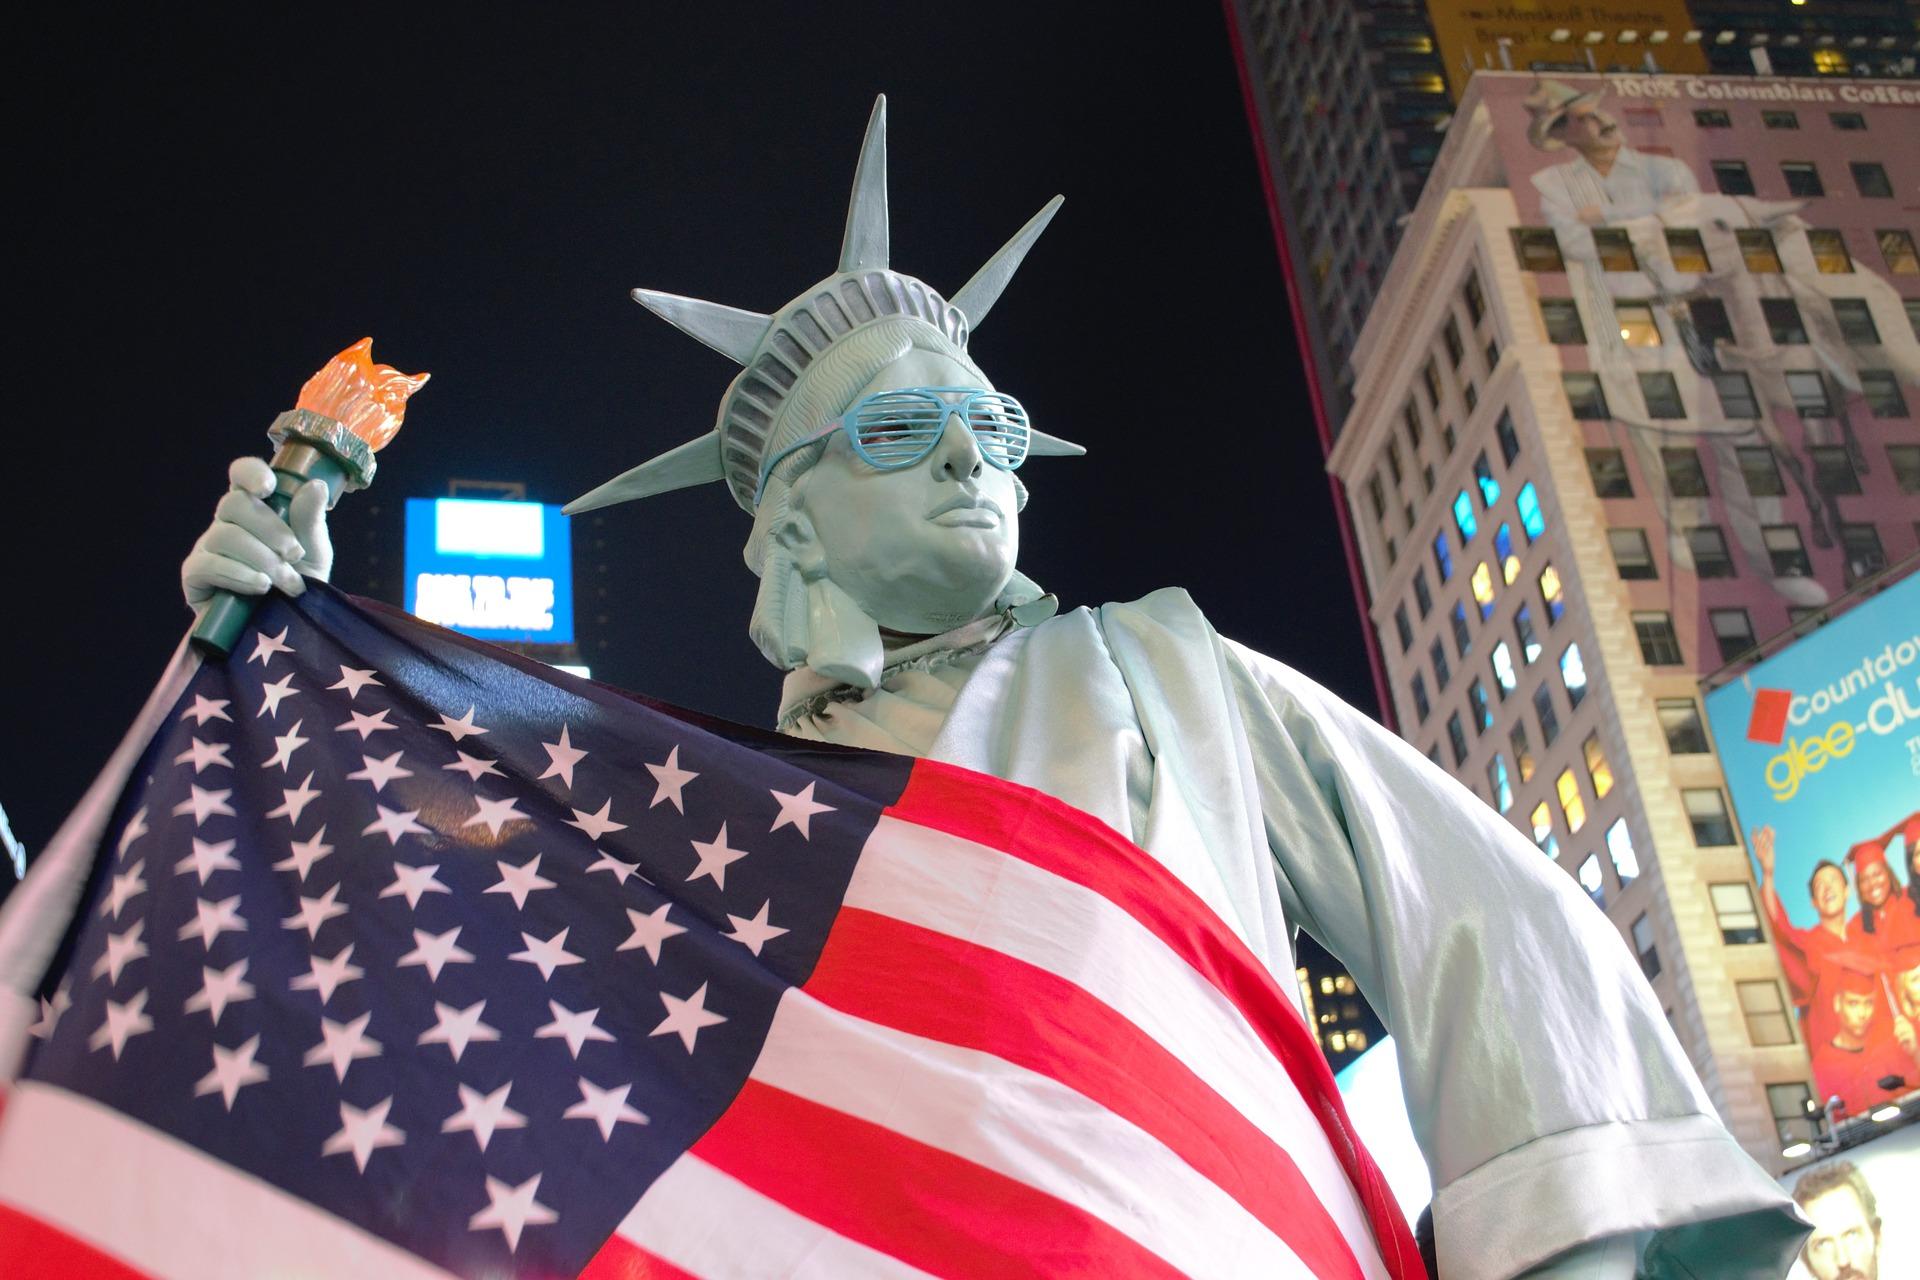 The transition of Americans from pragmatic to emotional politics. Rostislav Ischenko